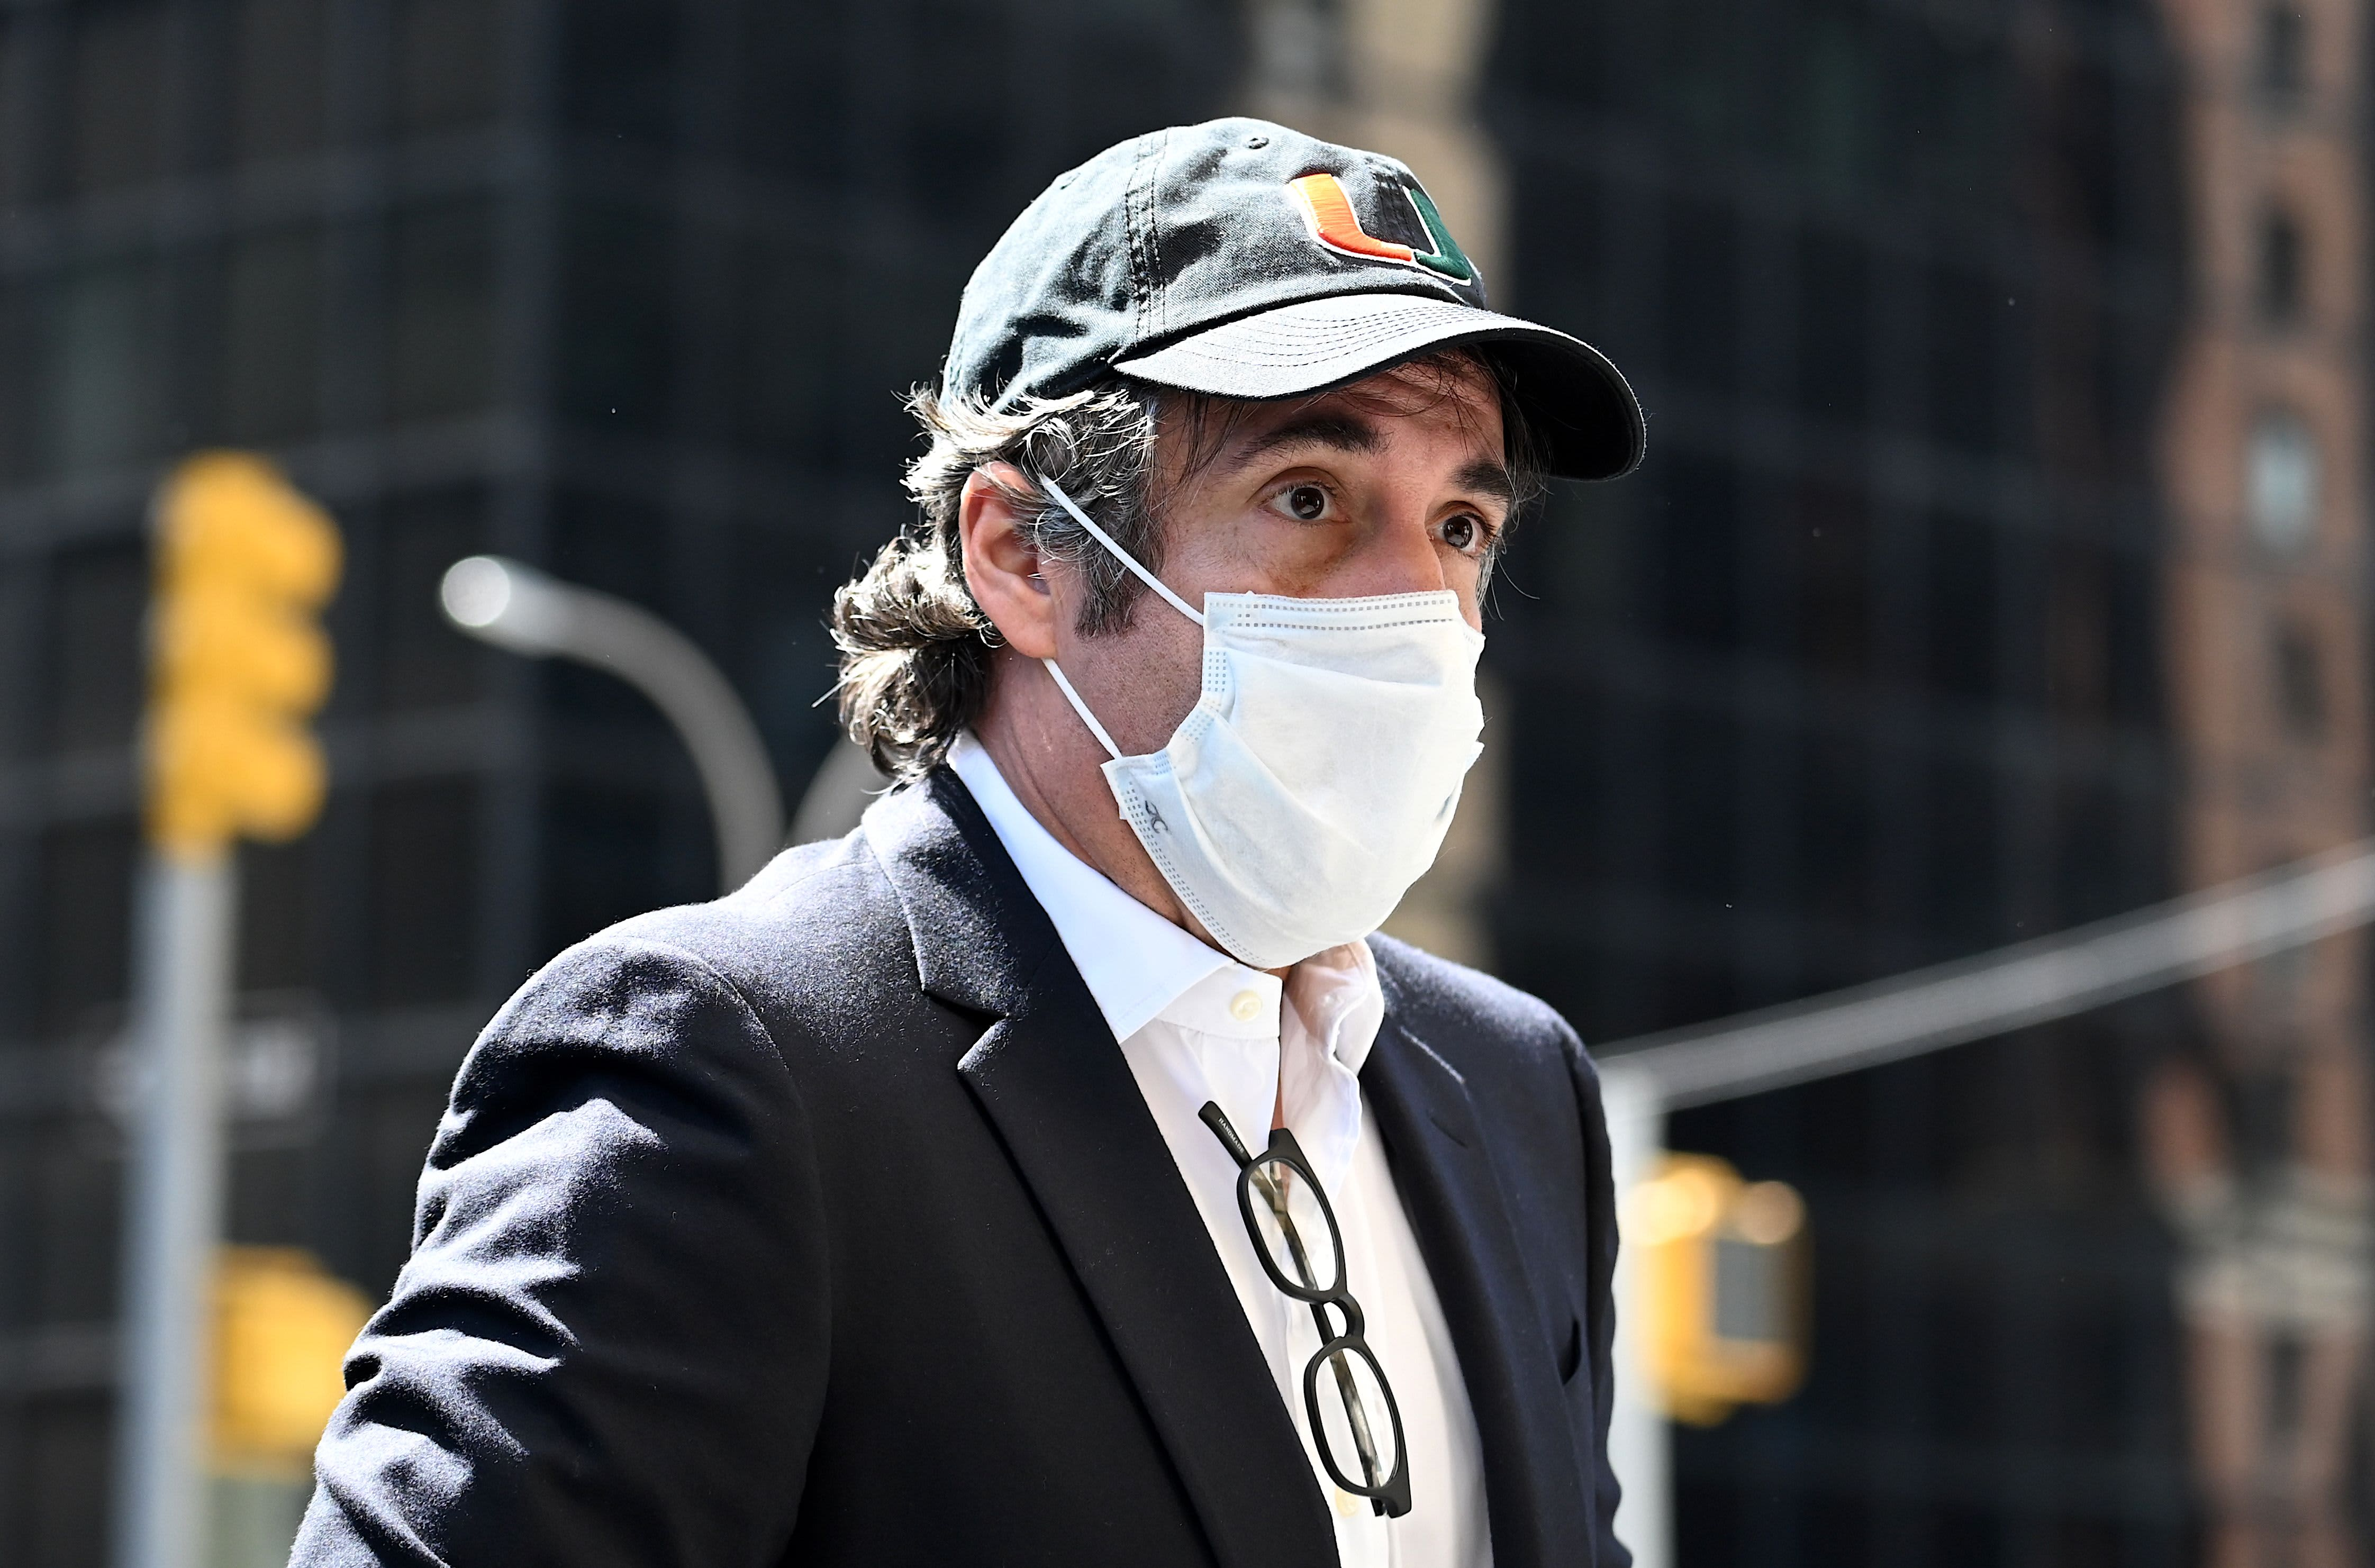 Trump's ex-lawyer Michael Cohen taken into custody after he balks at media gag